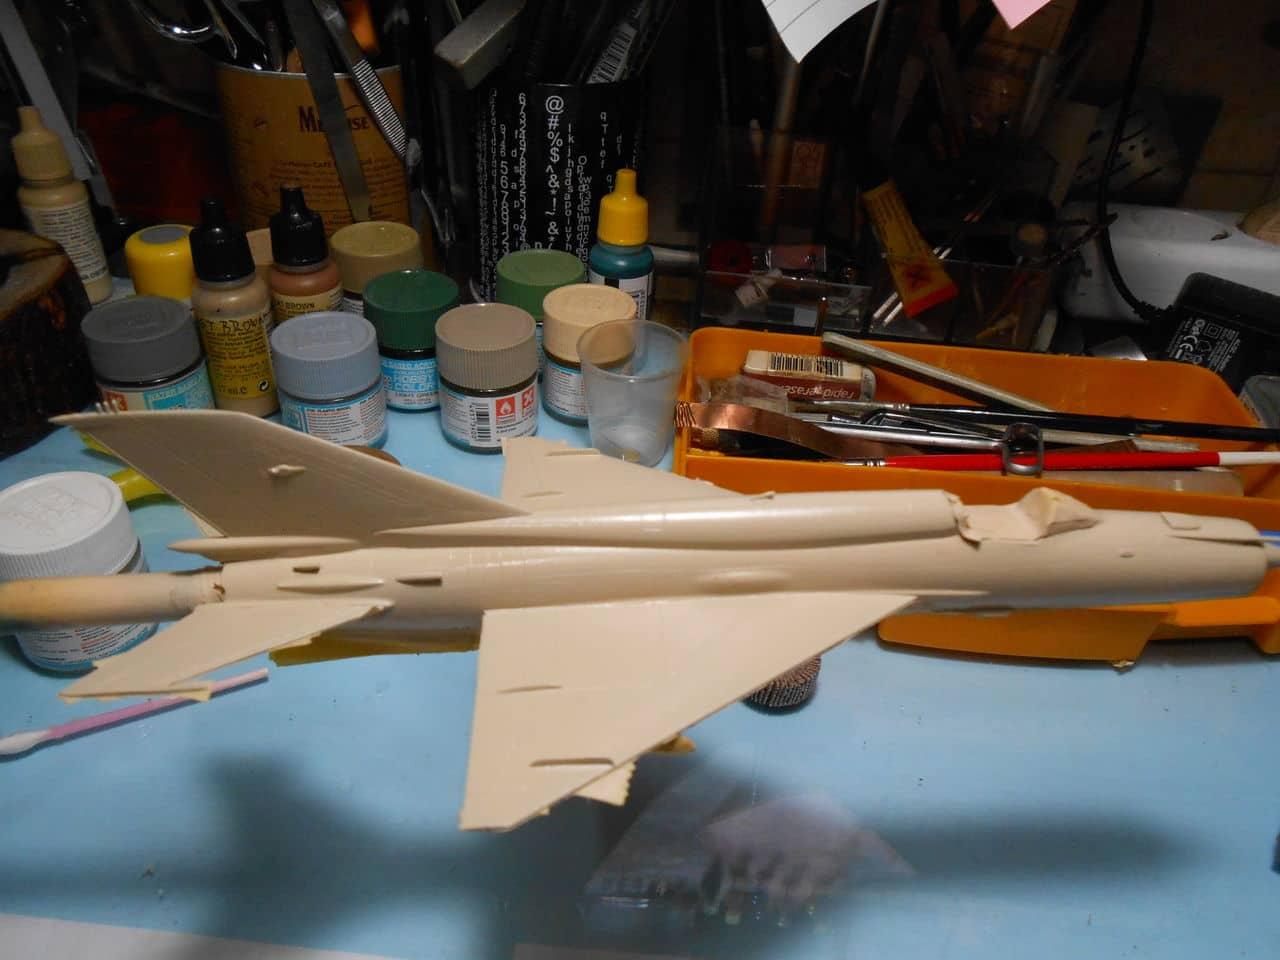 MiG 21 R MAC μεγαλο θεμα  - Σελίδα 2 DSCN1595